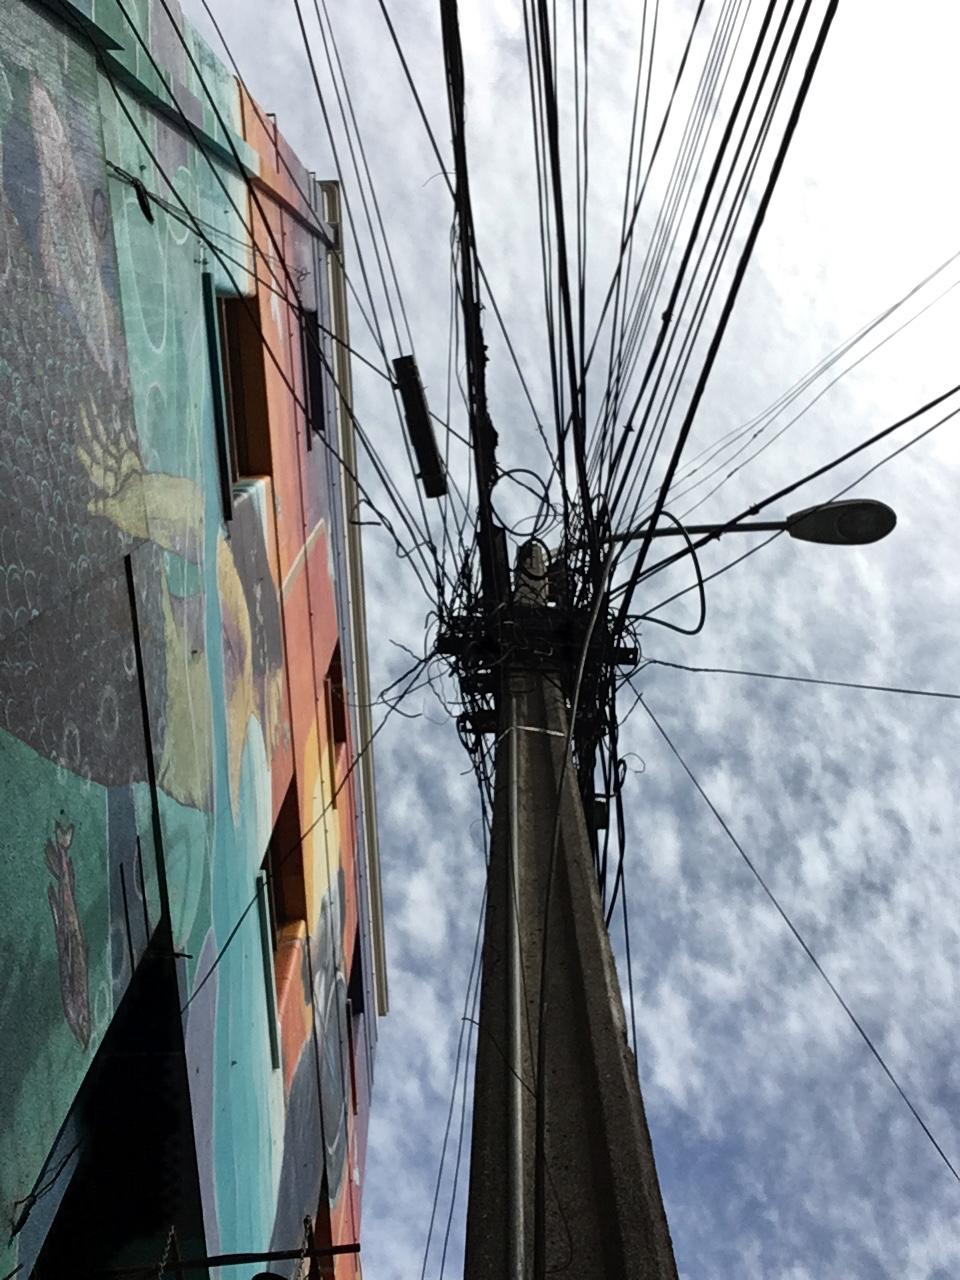 Chile_Valparaisograffiti11